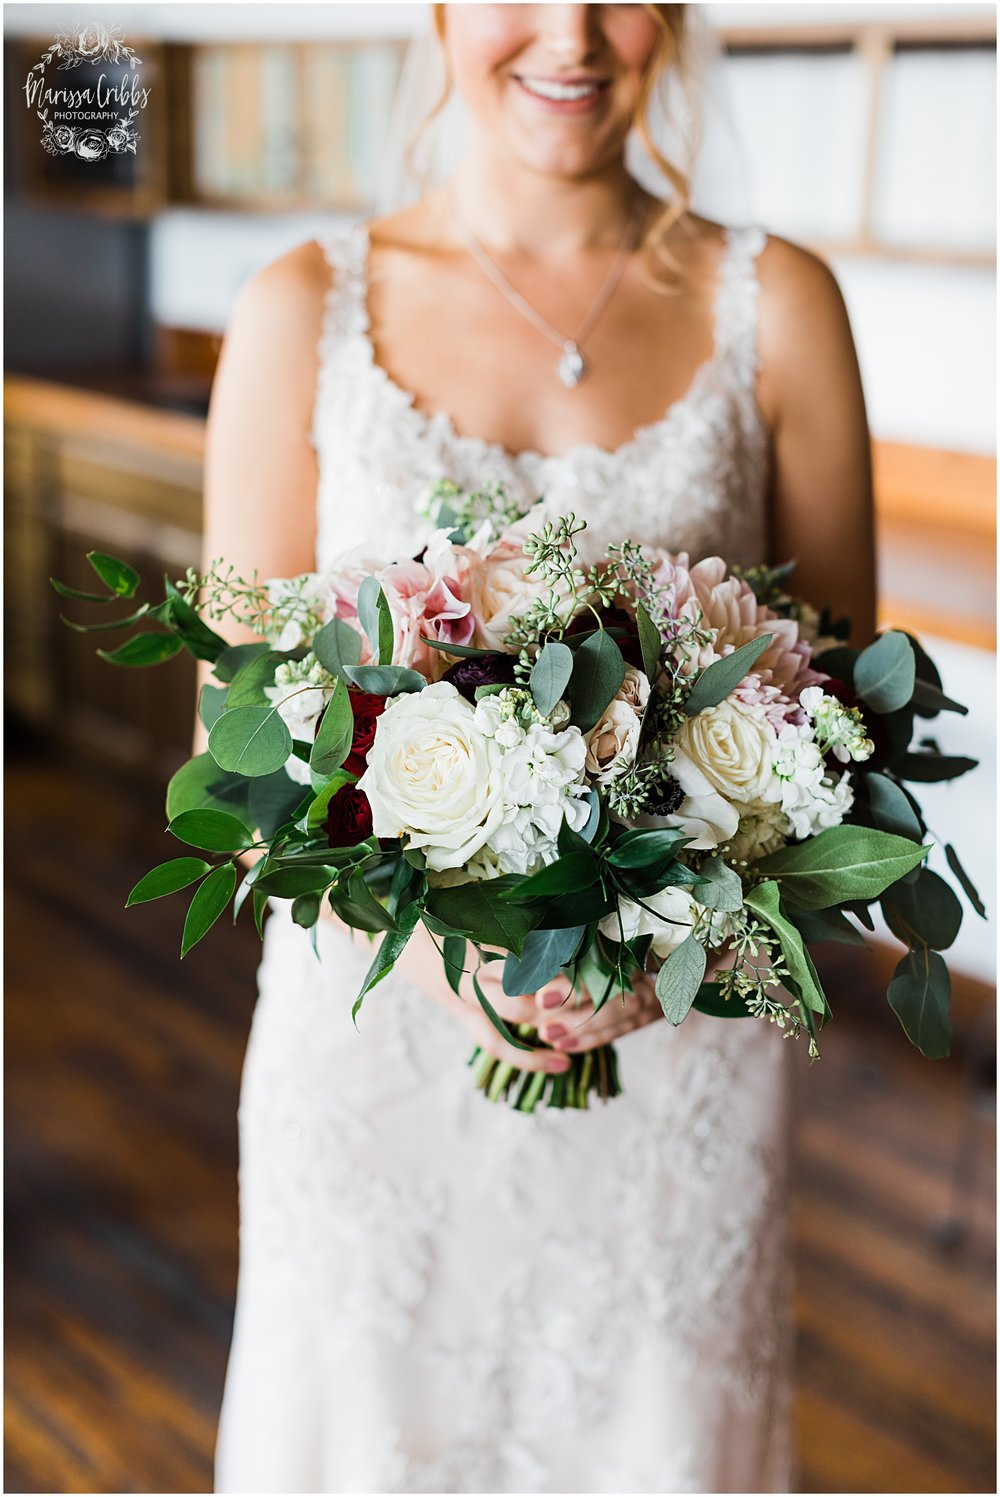 BAUER WEDDING | KELSEA & JUSTIN | MARISSA CRIBBS PHOTOGRAPHY_6511.jpg